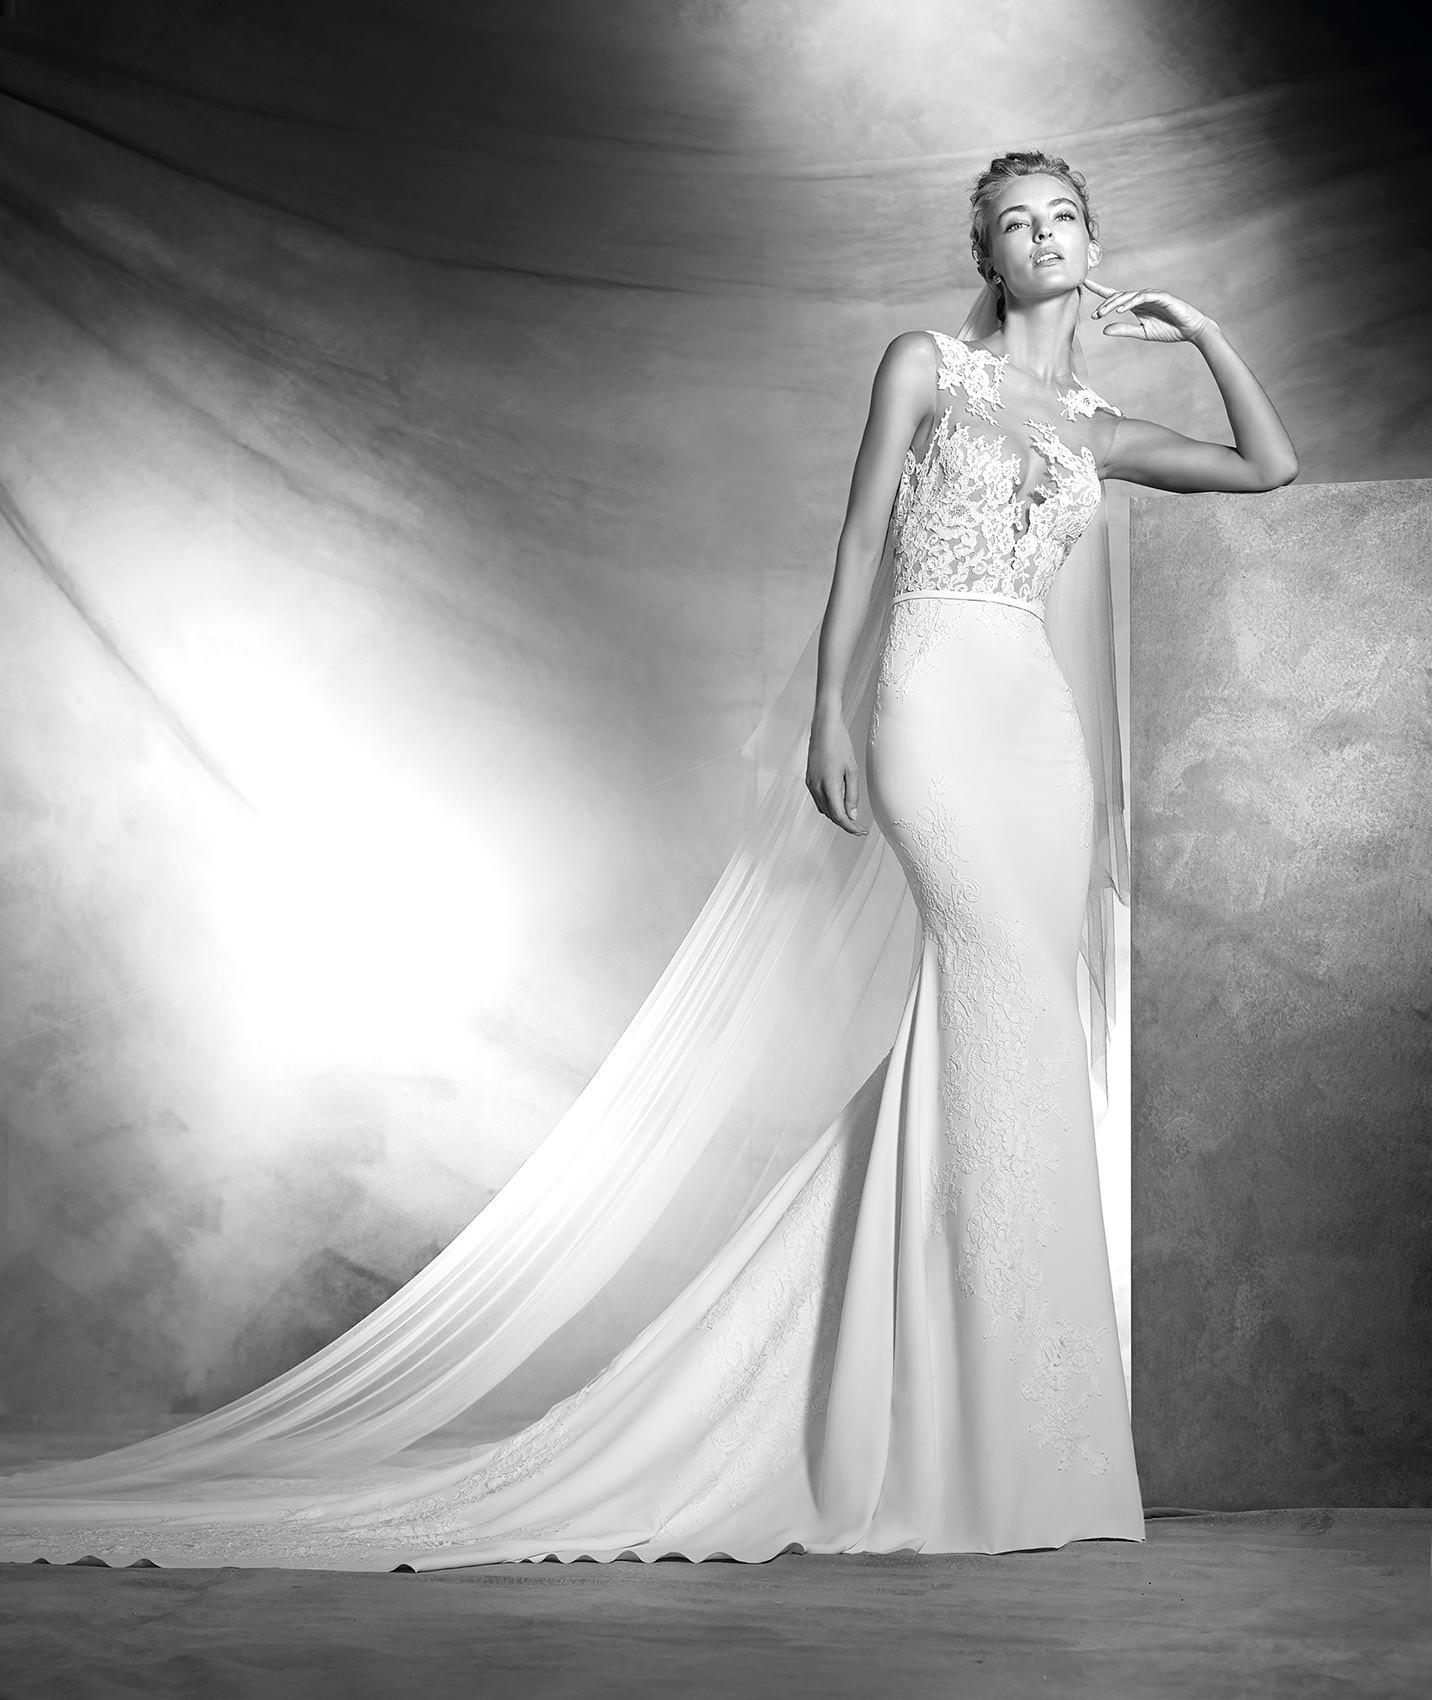 Vicenta-Pronovias-Atelier-wedding-dress.jpg